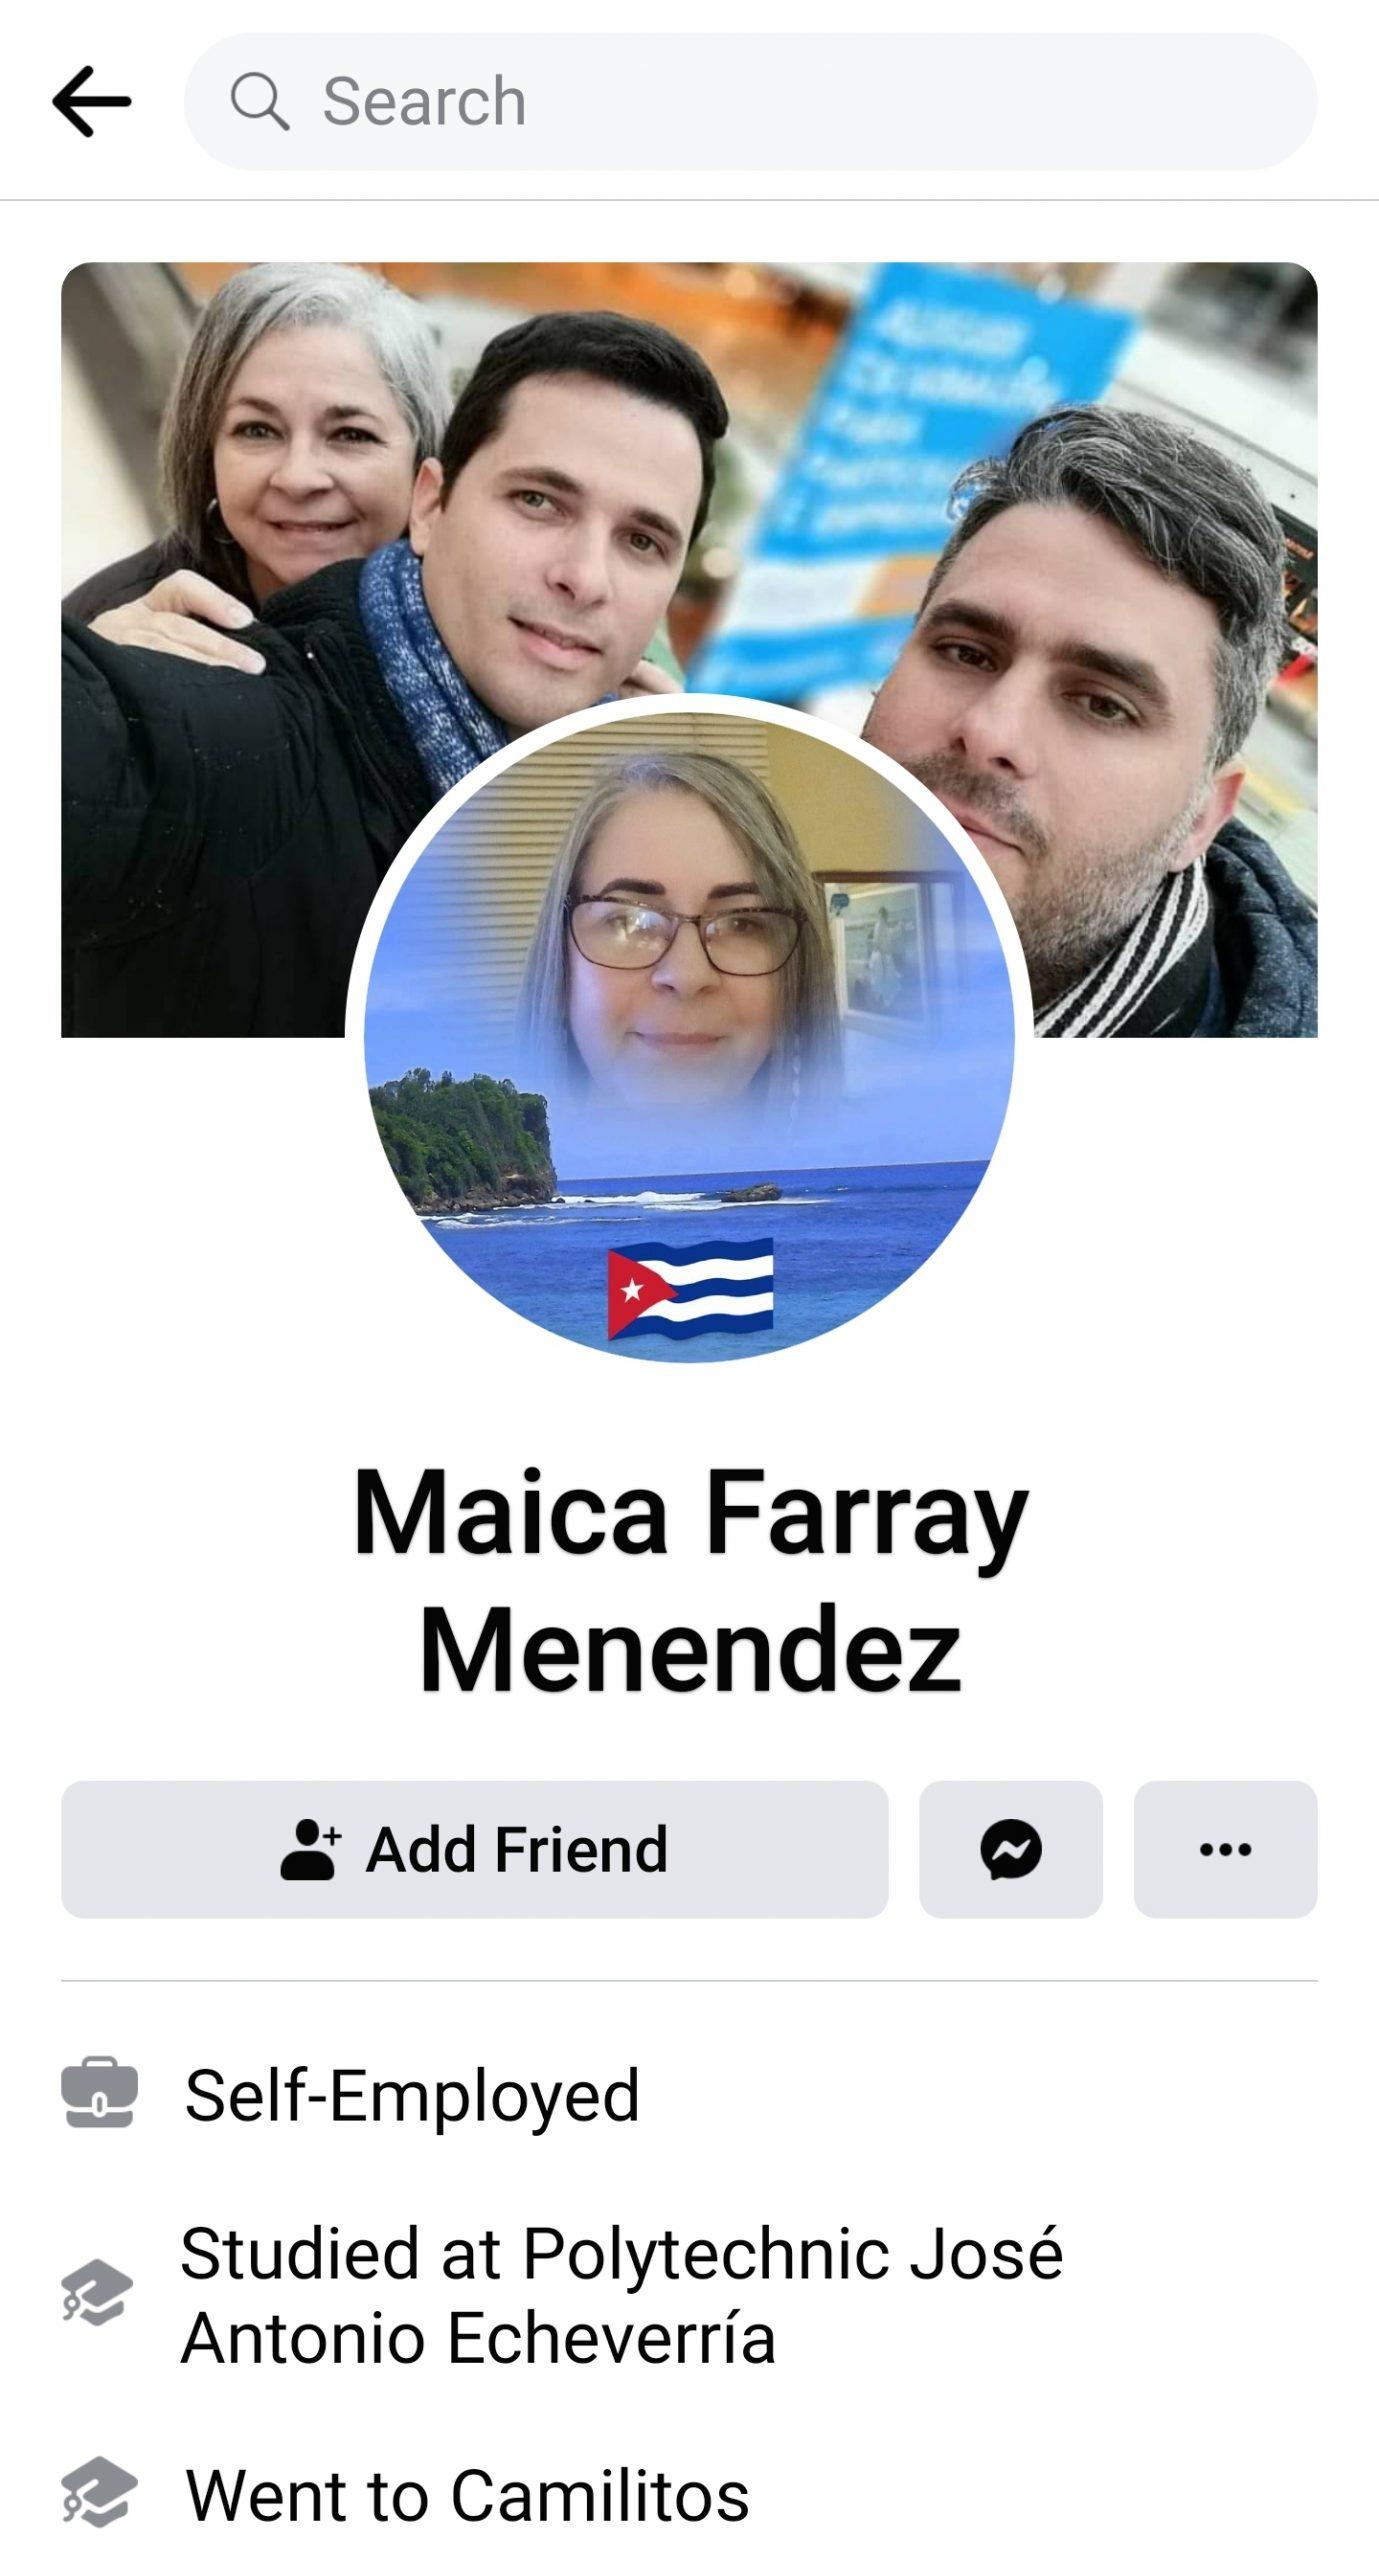 Maica Farray Menendez